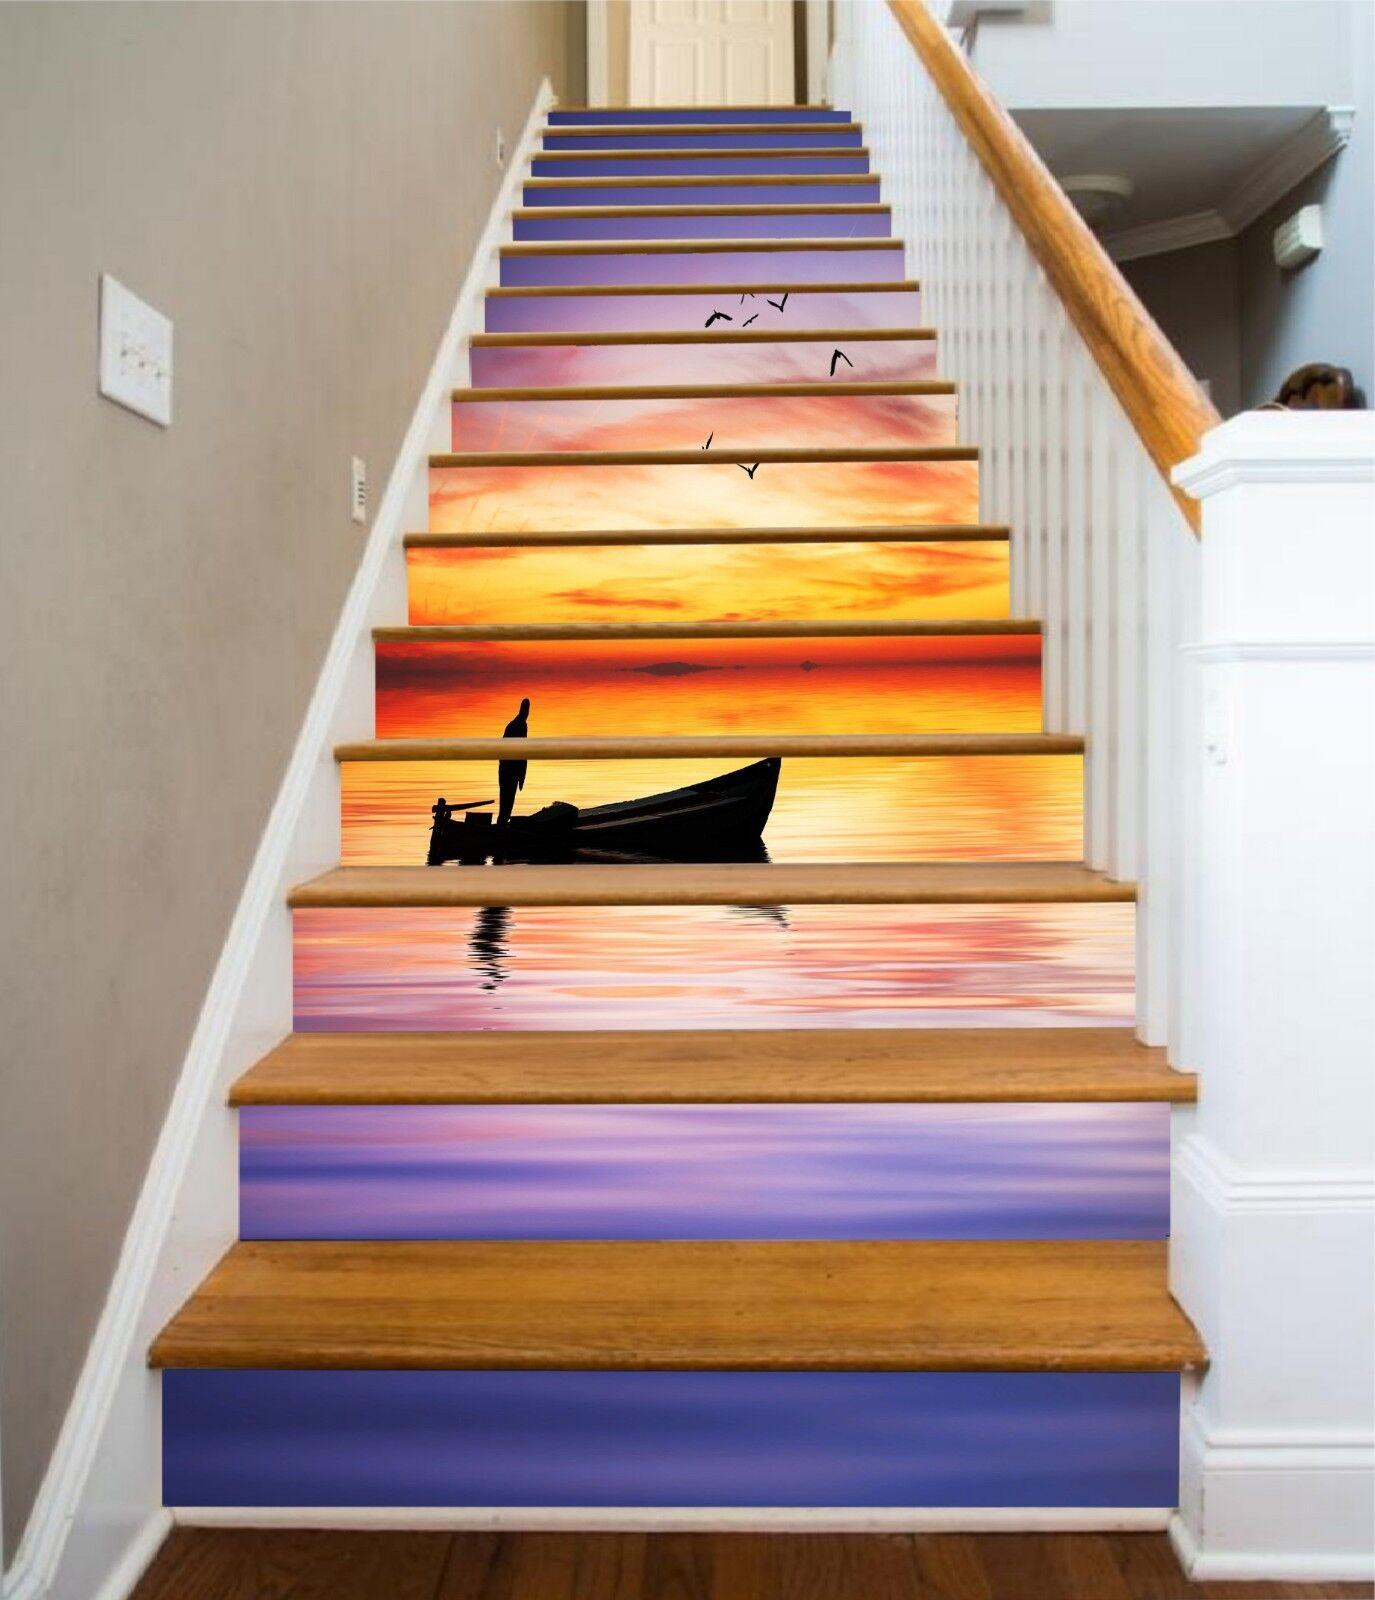 3D Boat Sunset Stair Risers Decoration Photo Mural Vinyl Decal WandPapier CA